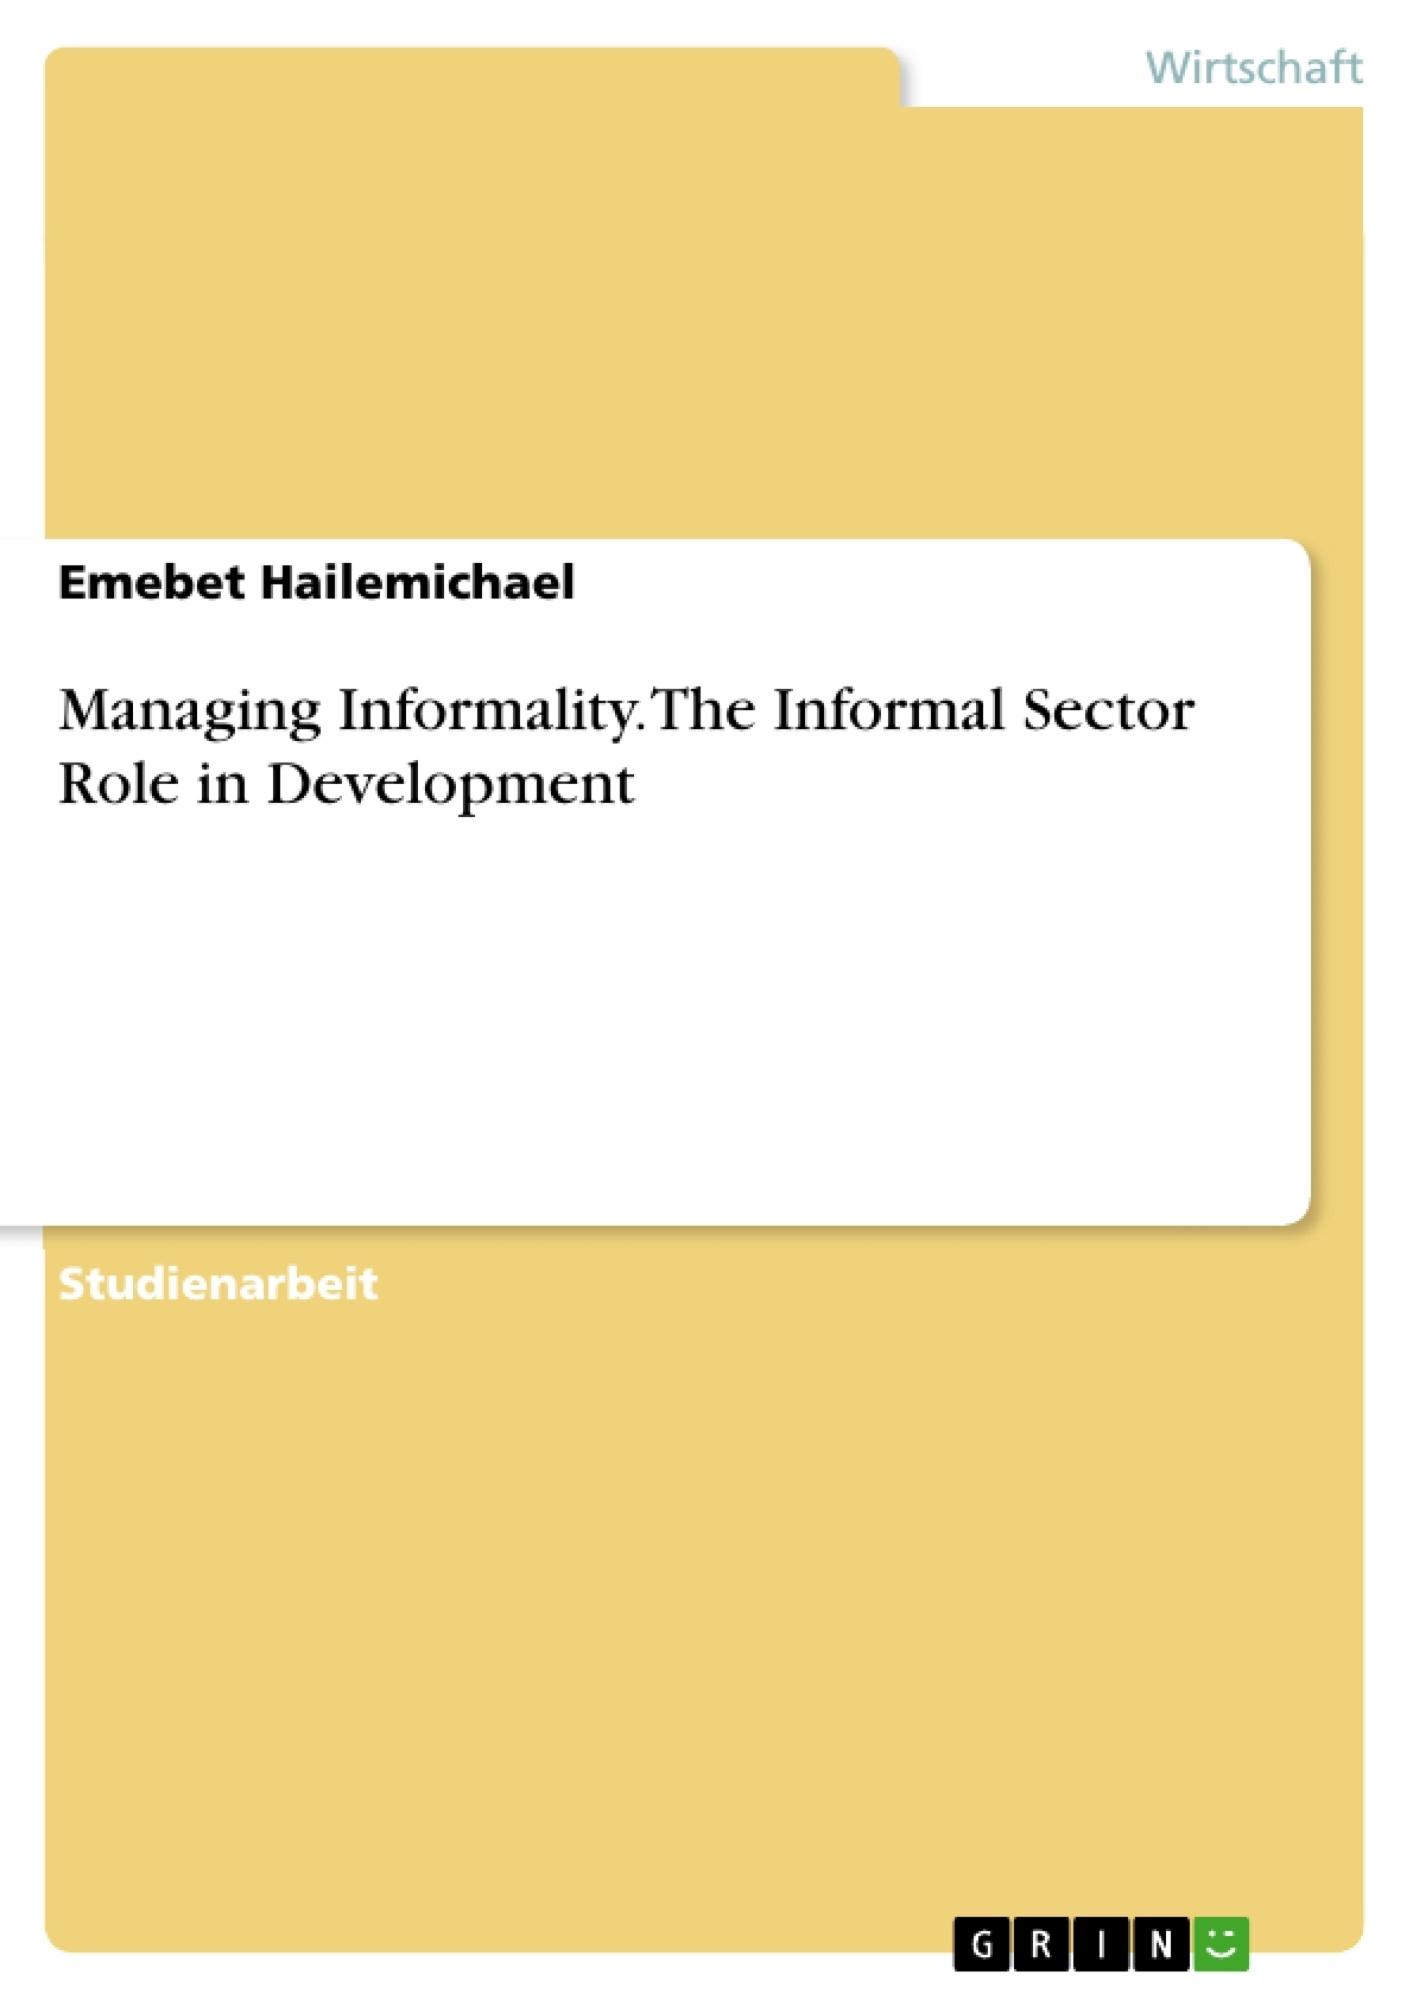 Titel: Managing Informality. The Informal Sector Role in Development